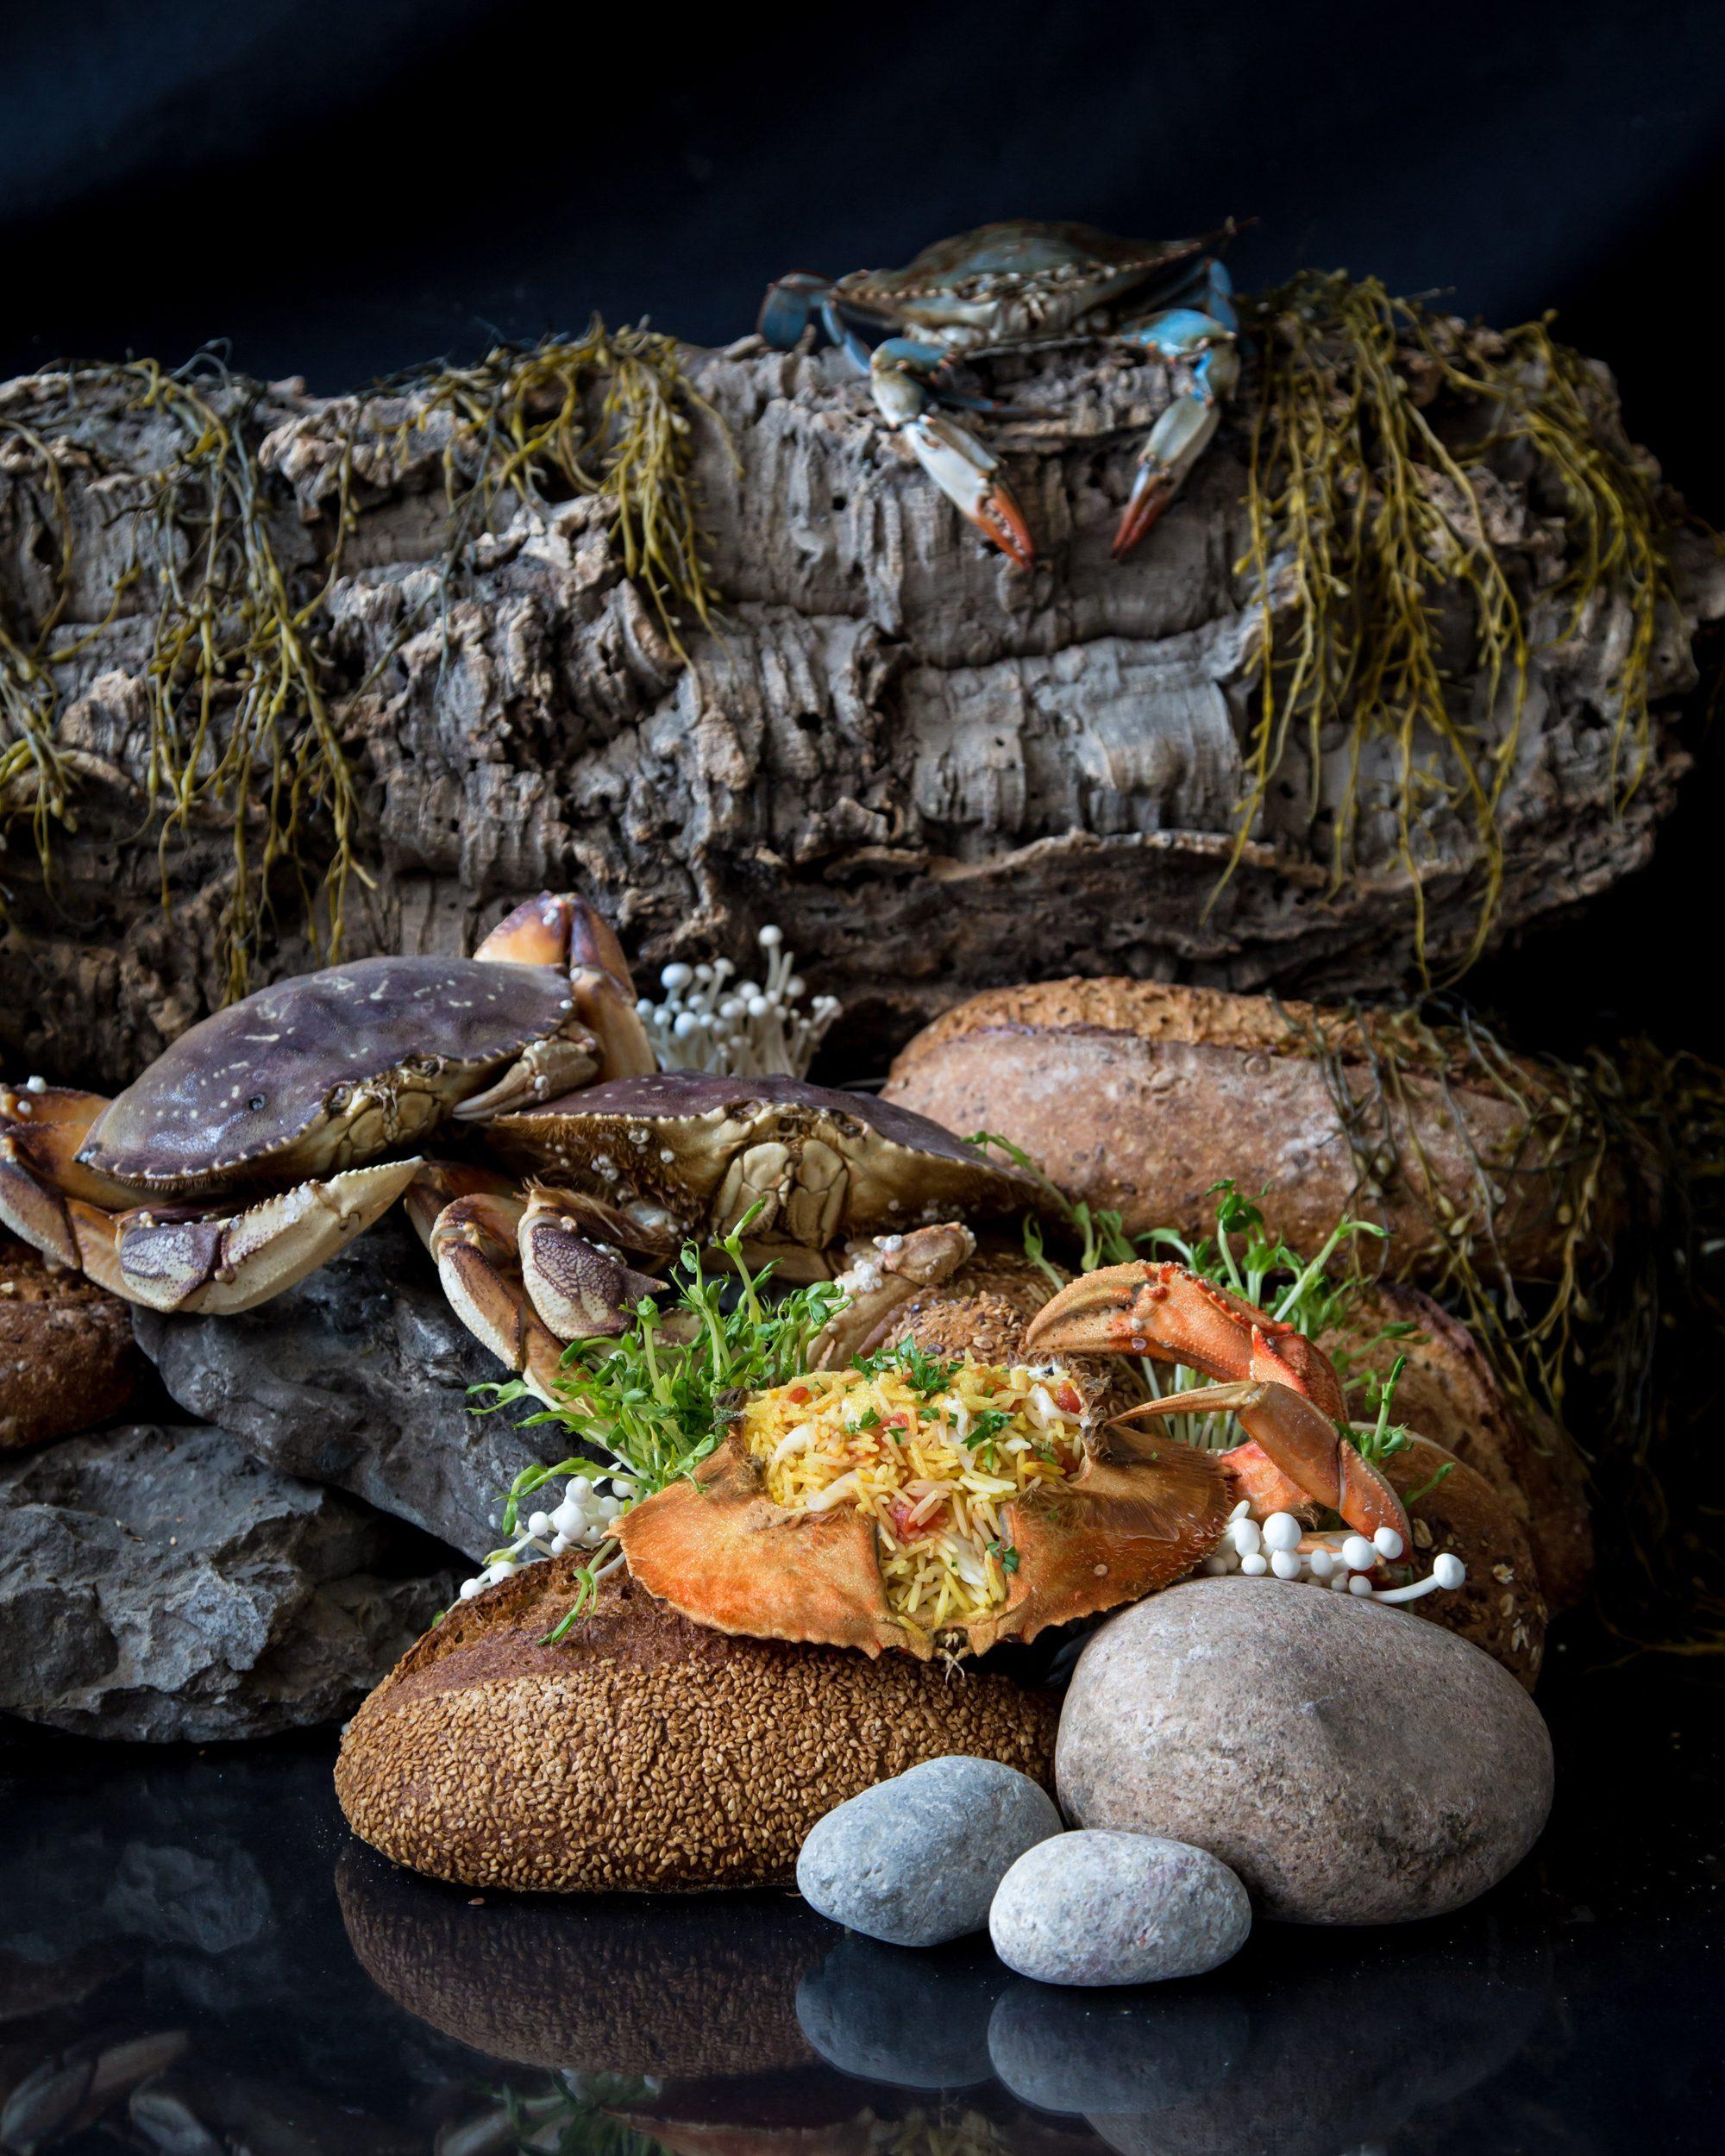 janice-poon-feeding-hannibal-crab-pilaf-web